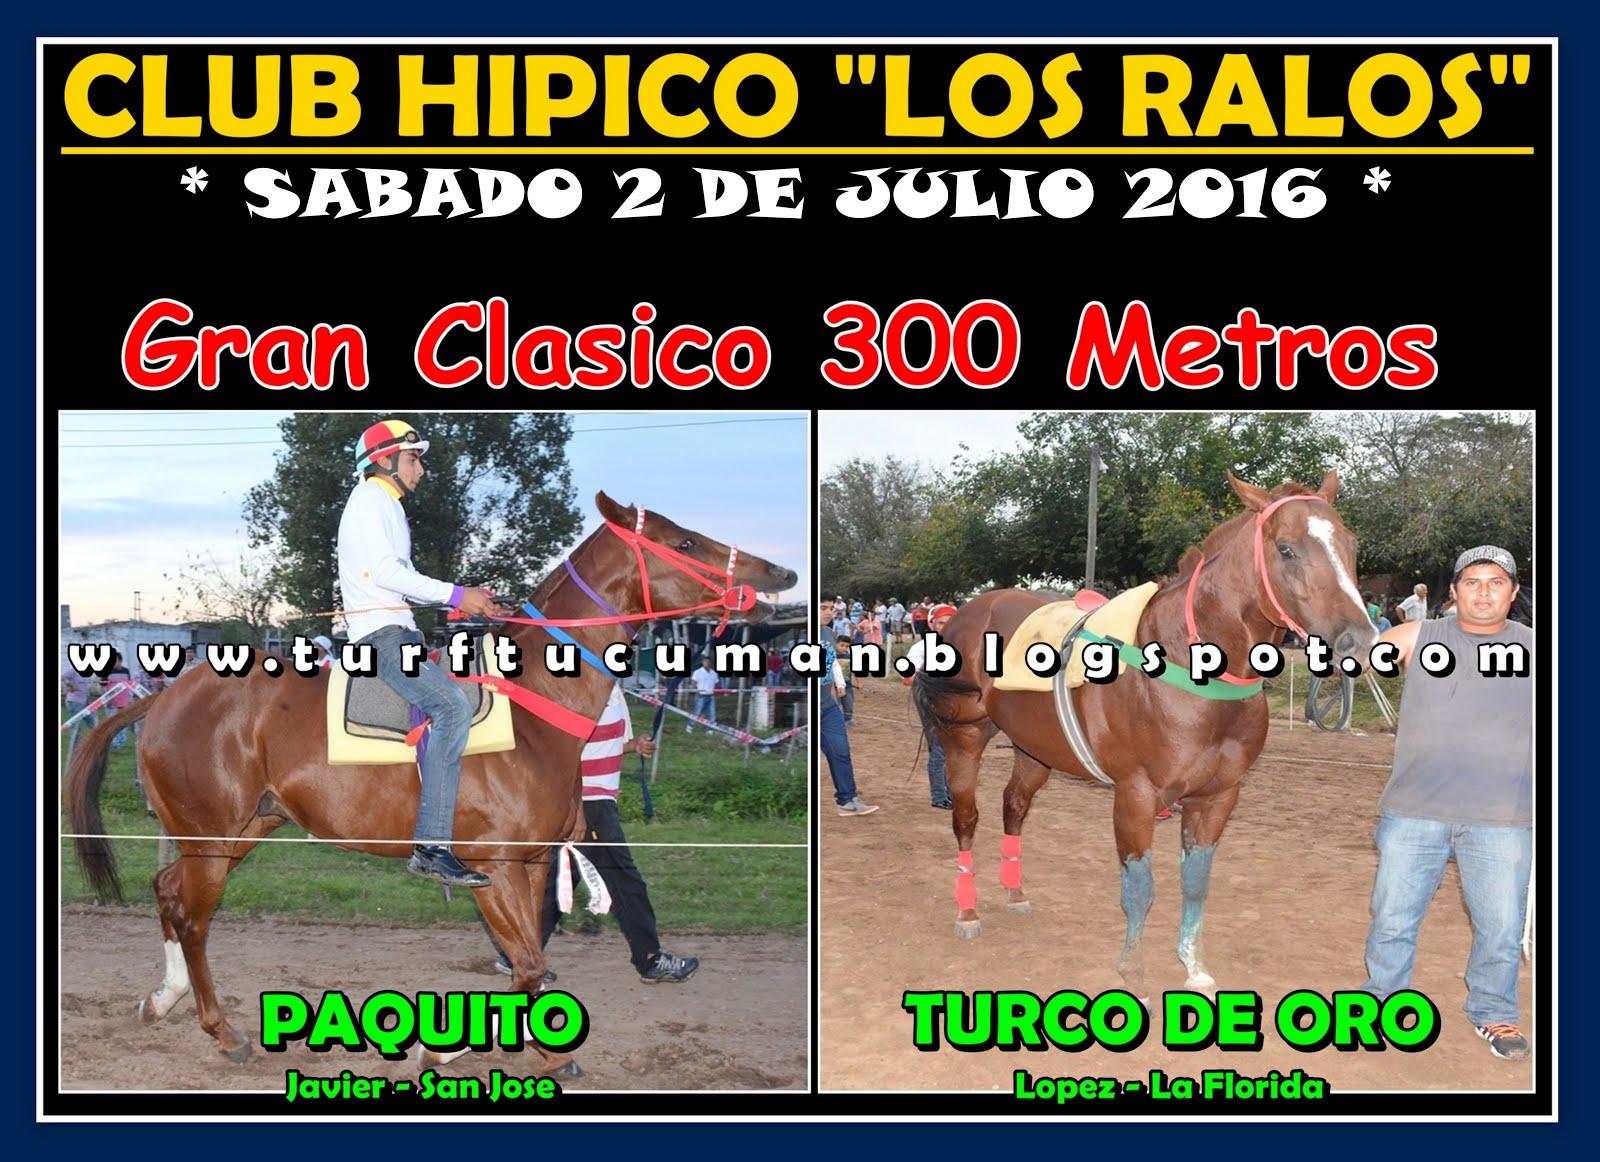 PAQUITO VS TURCO DE ORO